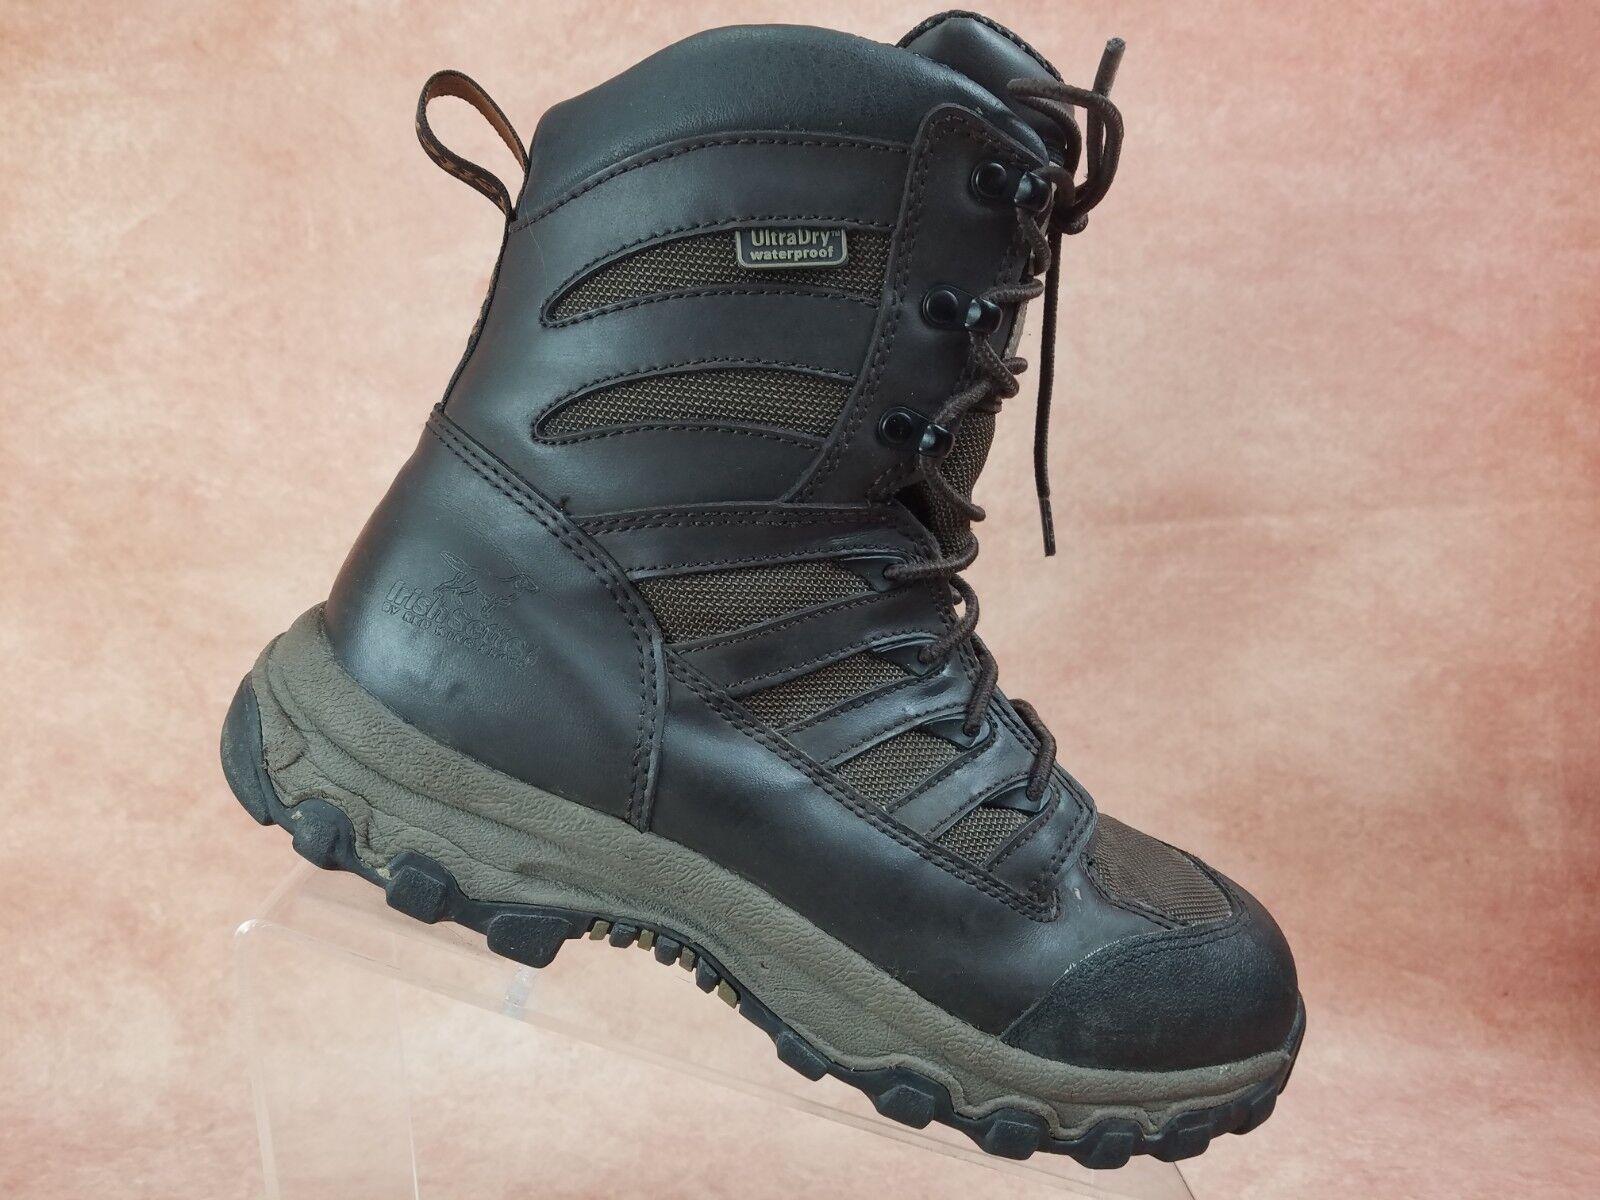 Irish Setter Lady Hawk Womens Ankle Boot Waterproof Size 9 Brown Leather 3886